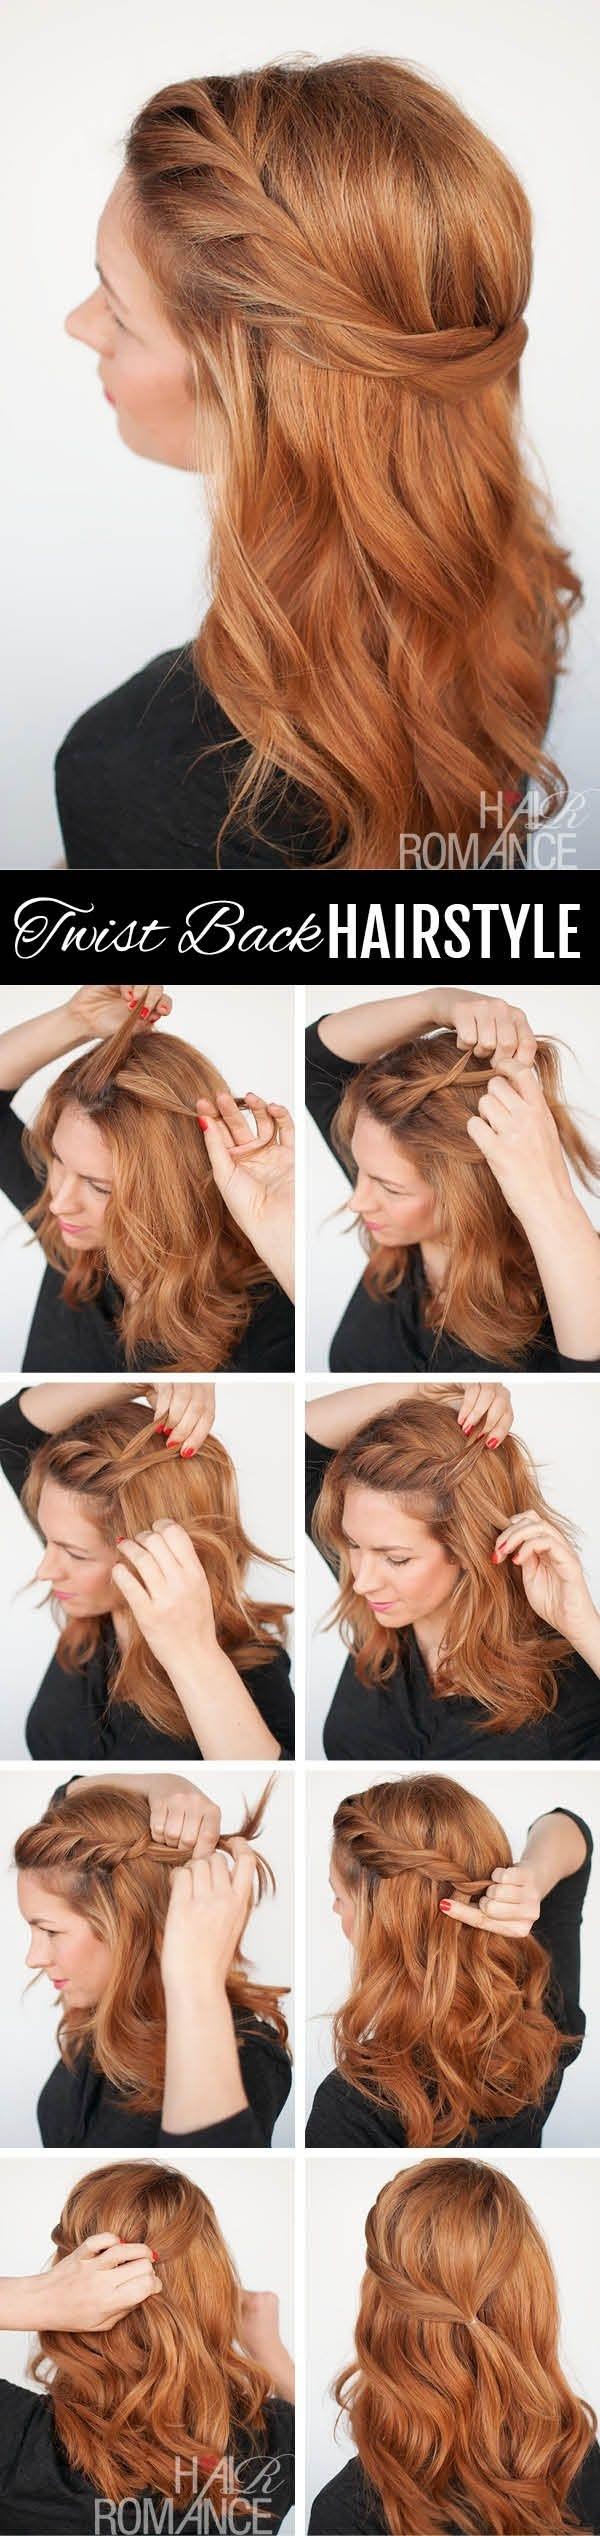 Astonishing 17 Gorgeous Hairstyles For Lazy Girls Hair Short Hairstyles For Black Women Fulllsitofus